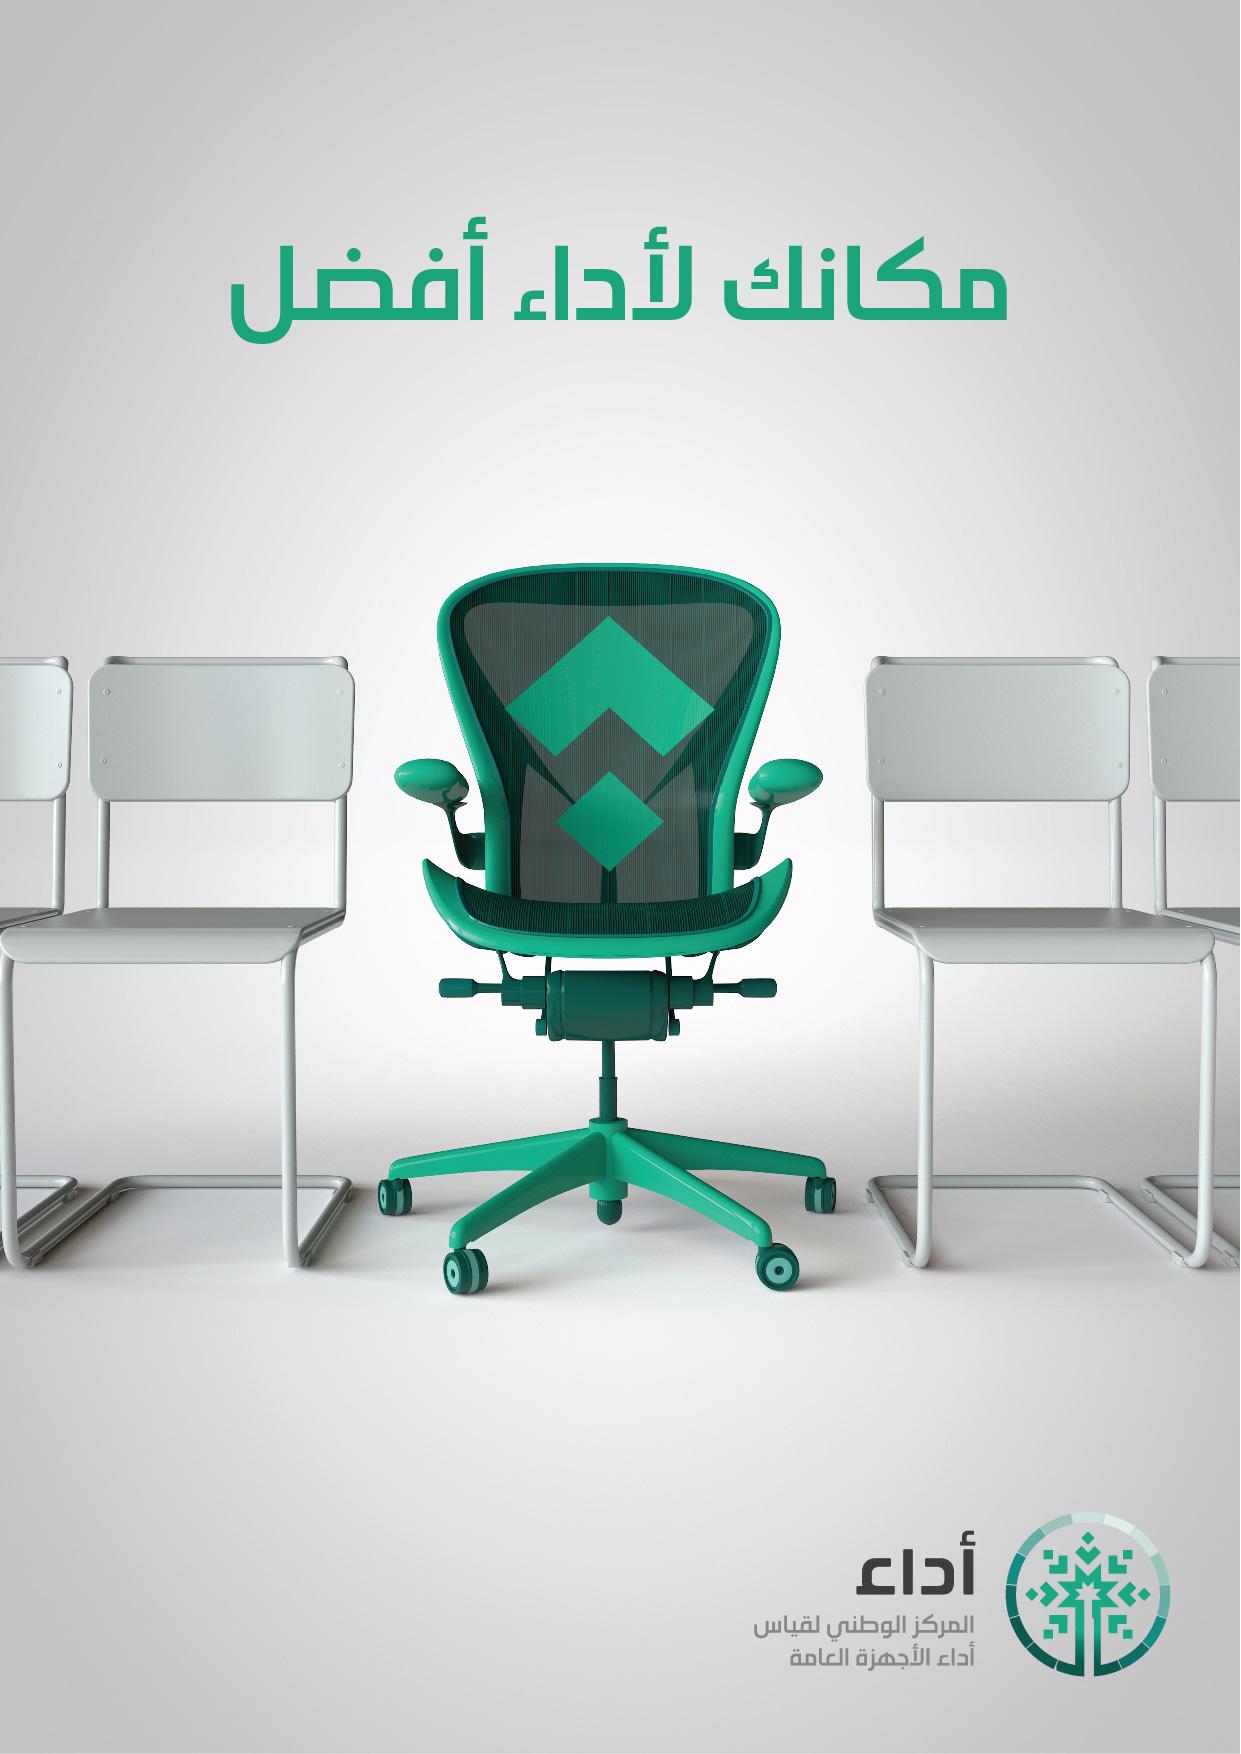 ADAA_HR_YOUR-PLACE_2-Chair.jpg